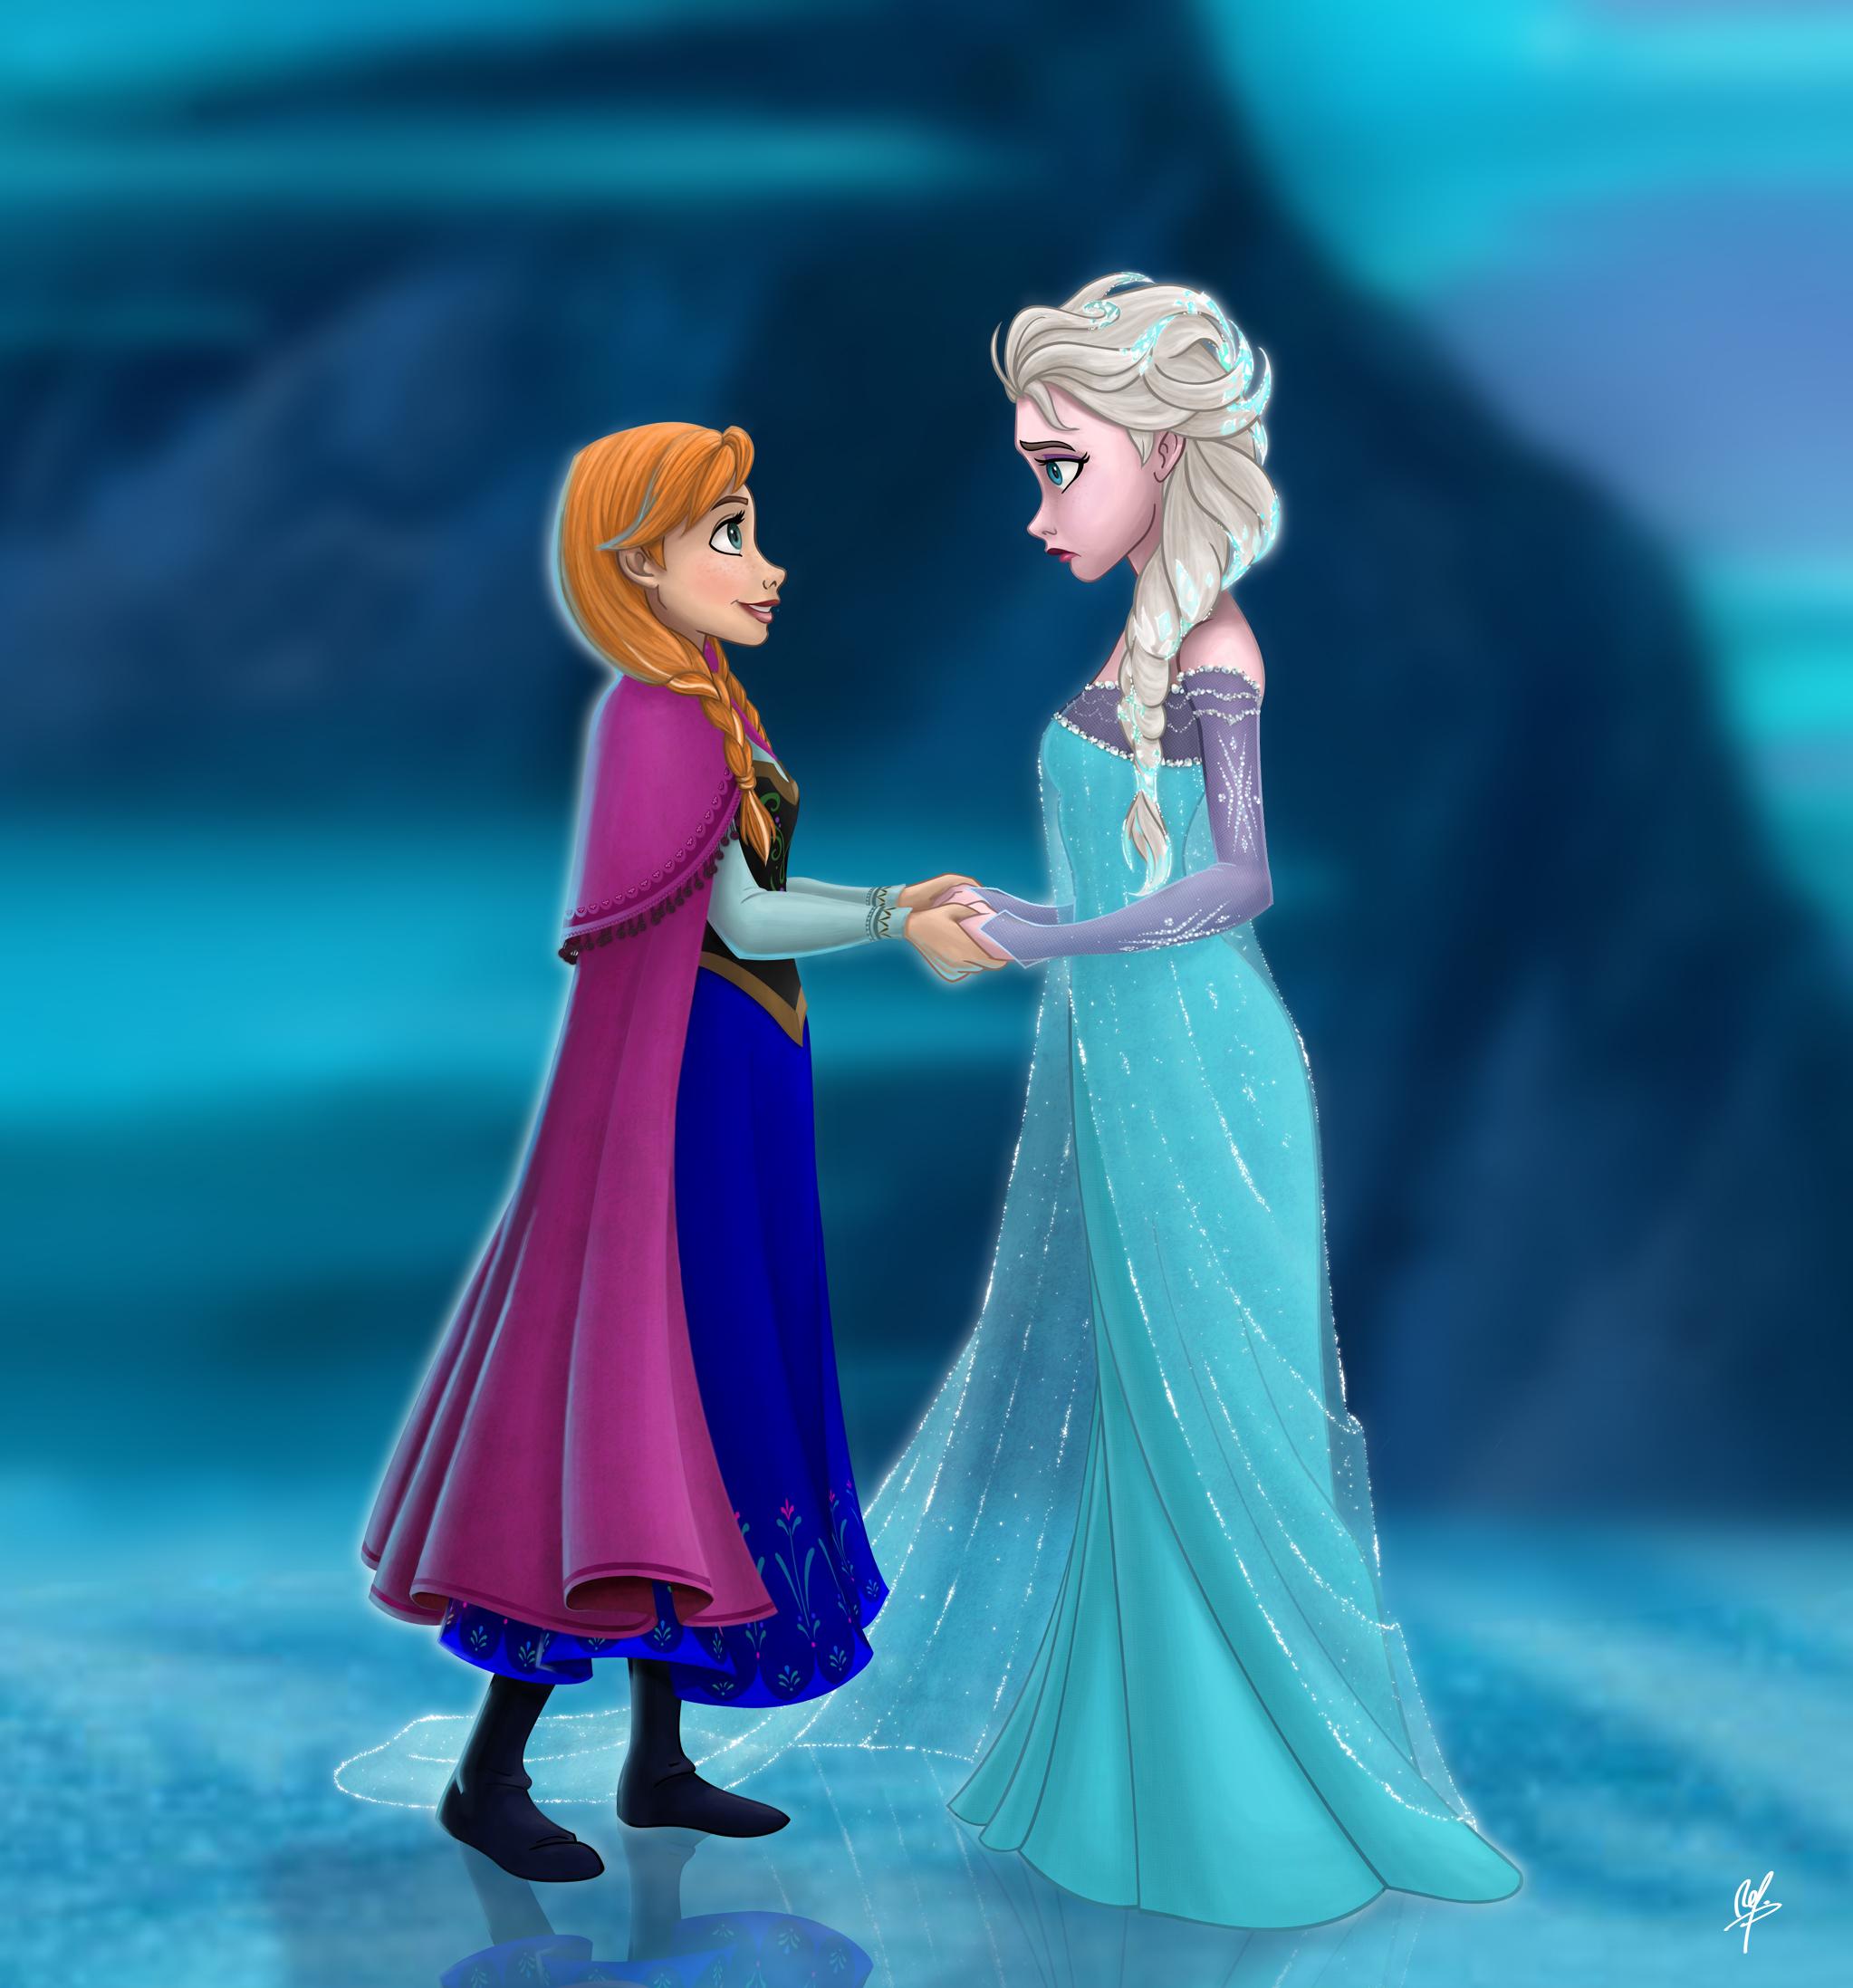 Disney Frozen - I came for you by RodrigoYborra